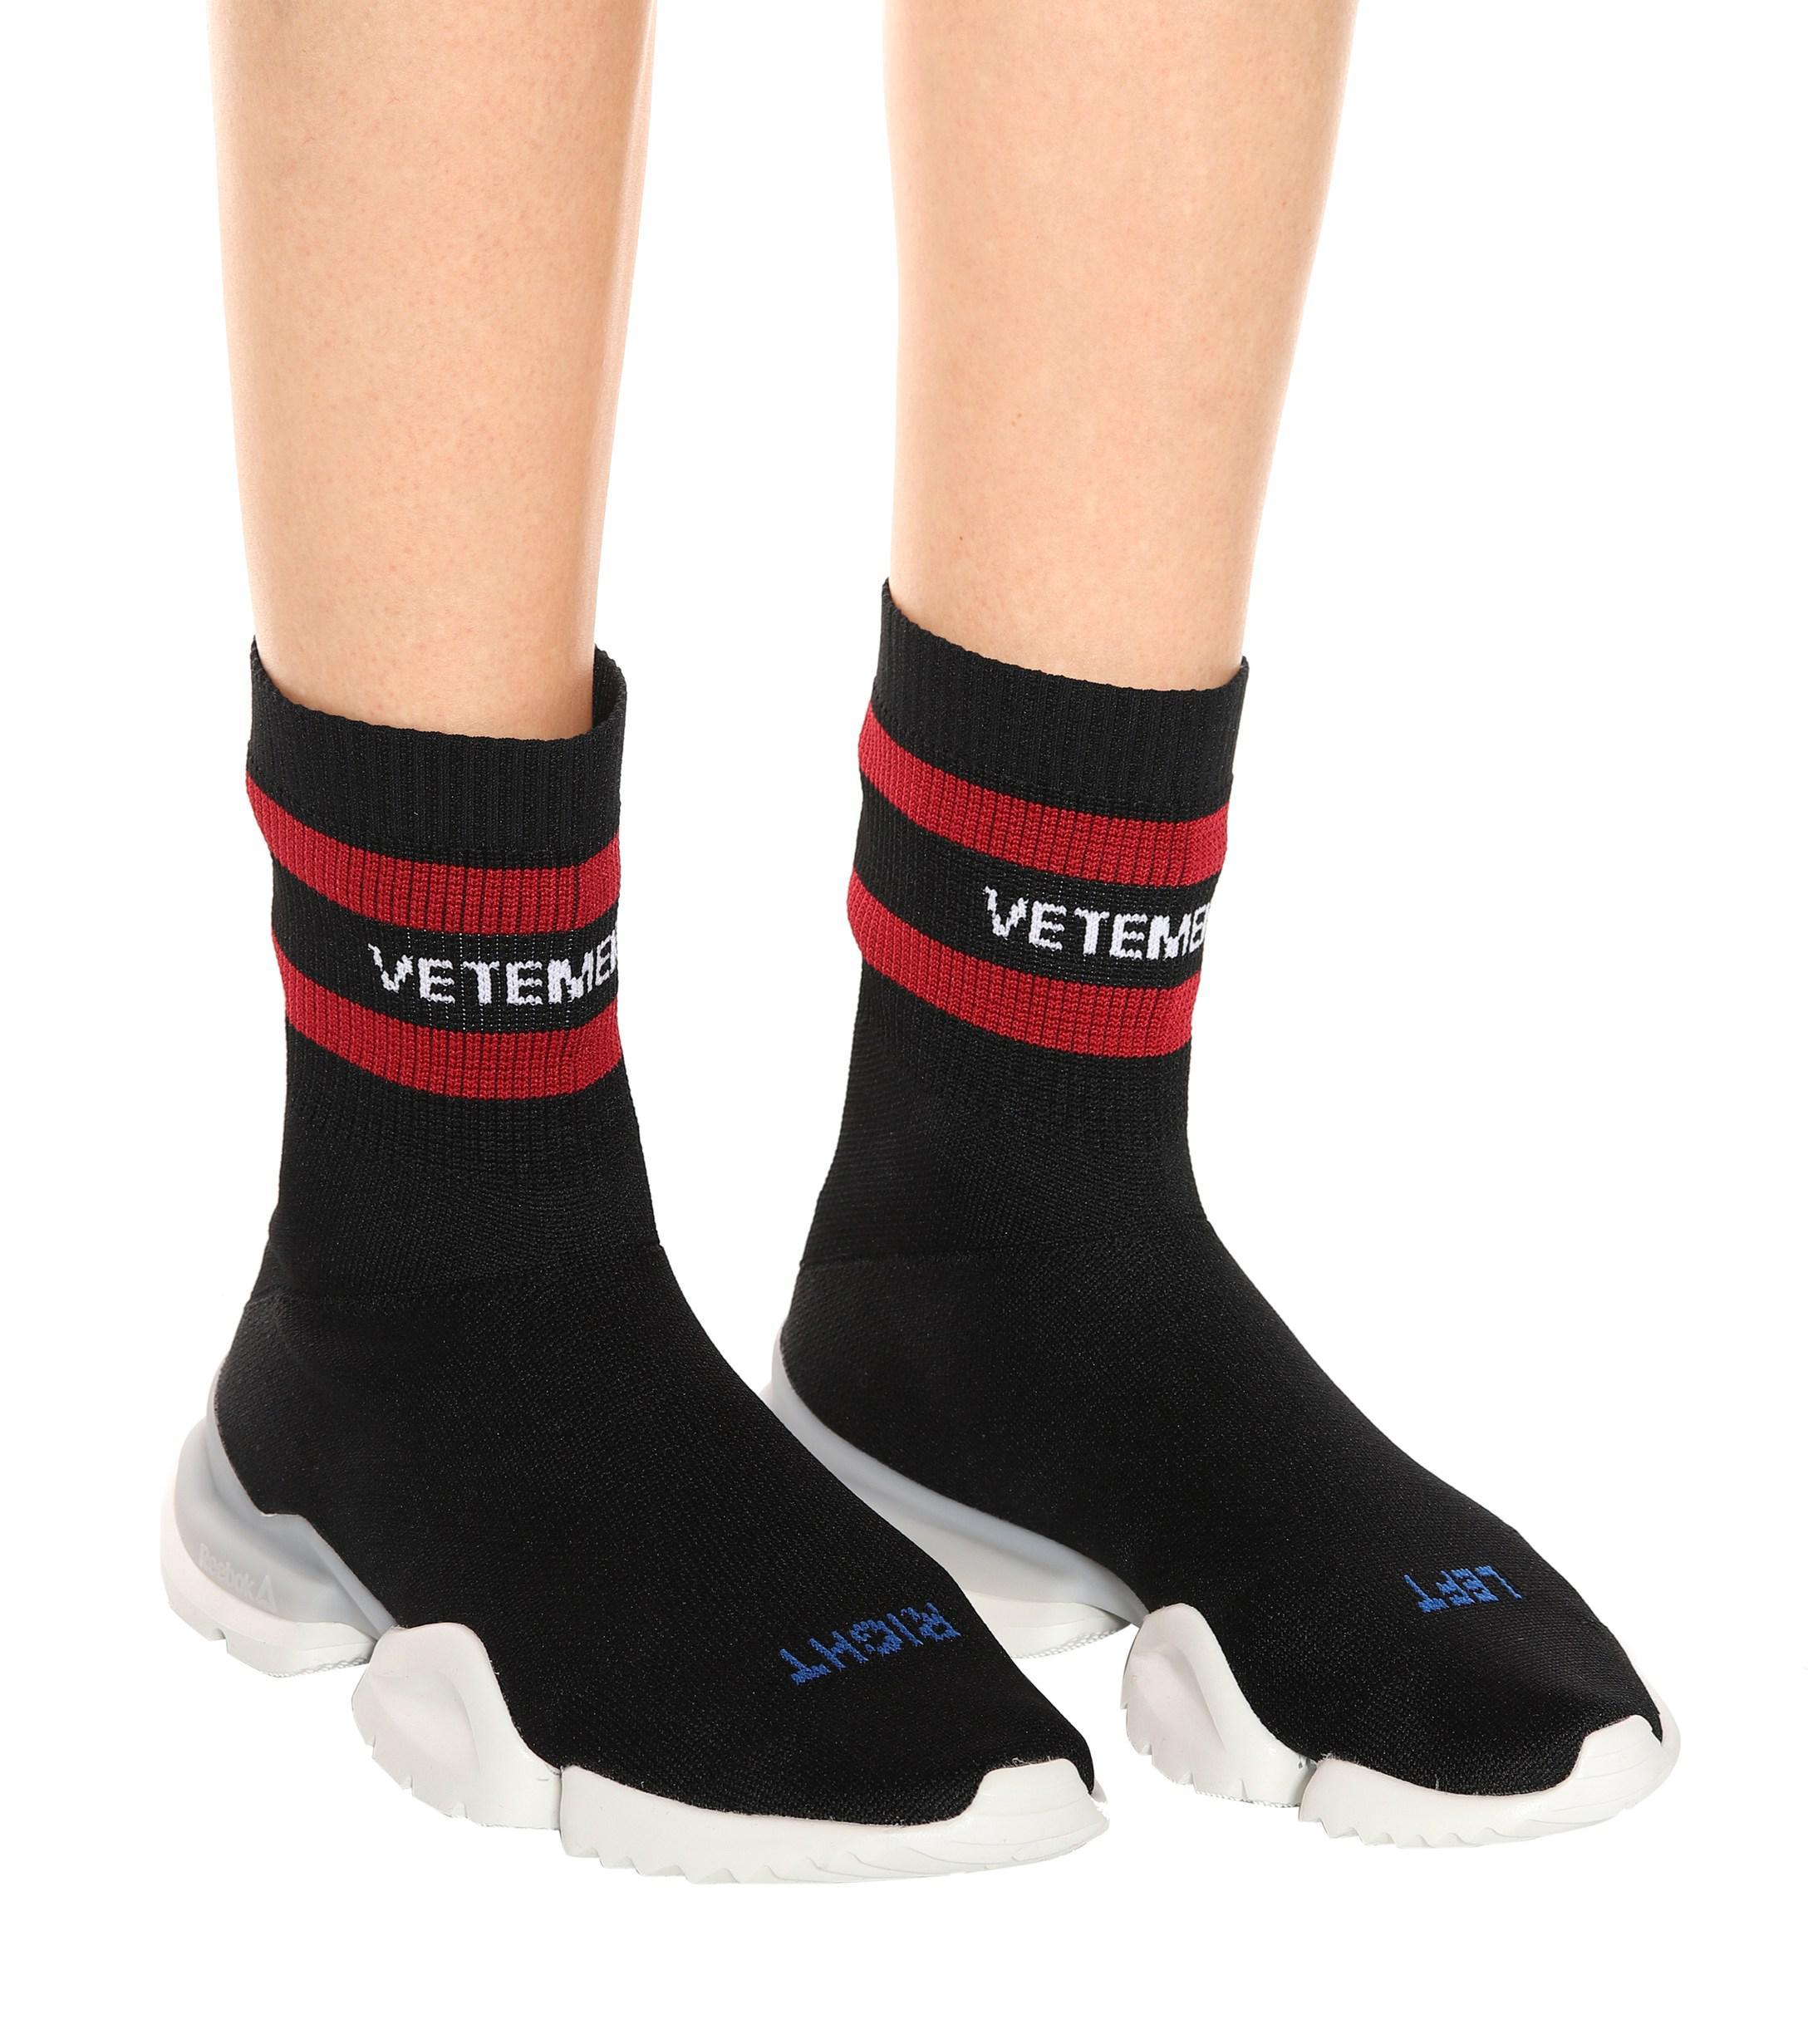 73b82be34dbb Lyst - Vetements X Reebok Stretch-knit Sneakers in Black - Save 86%